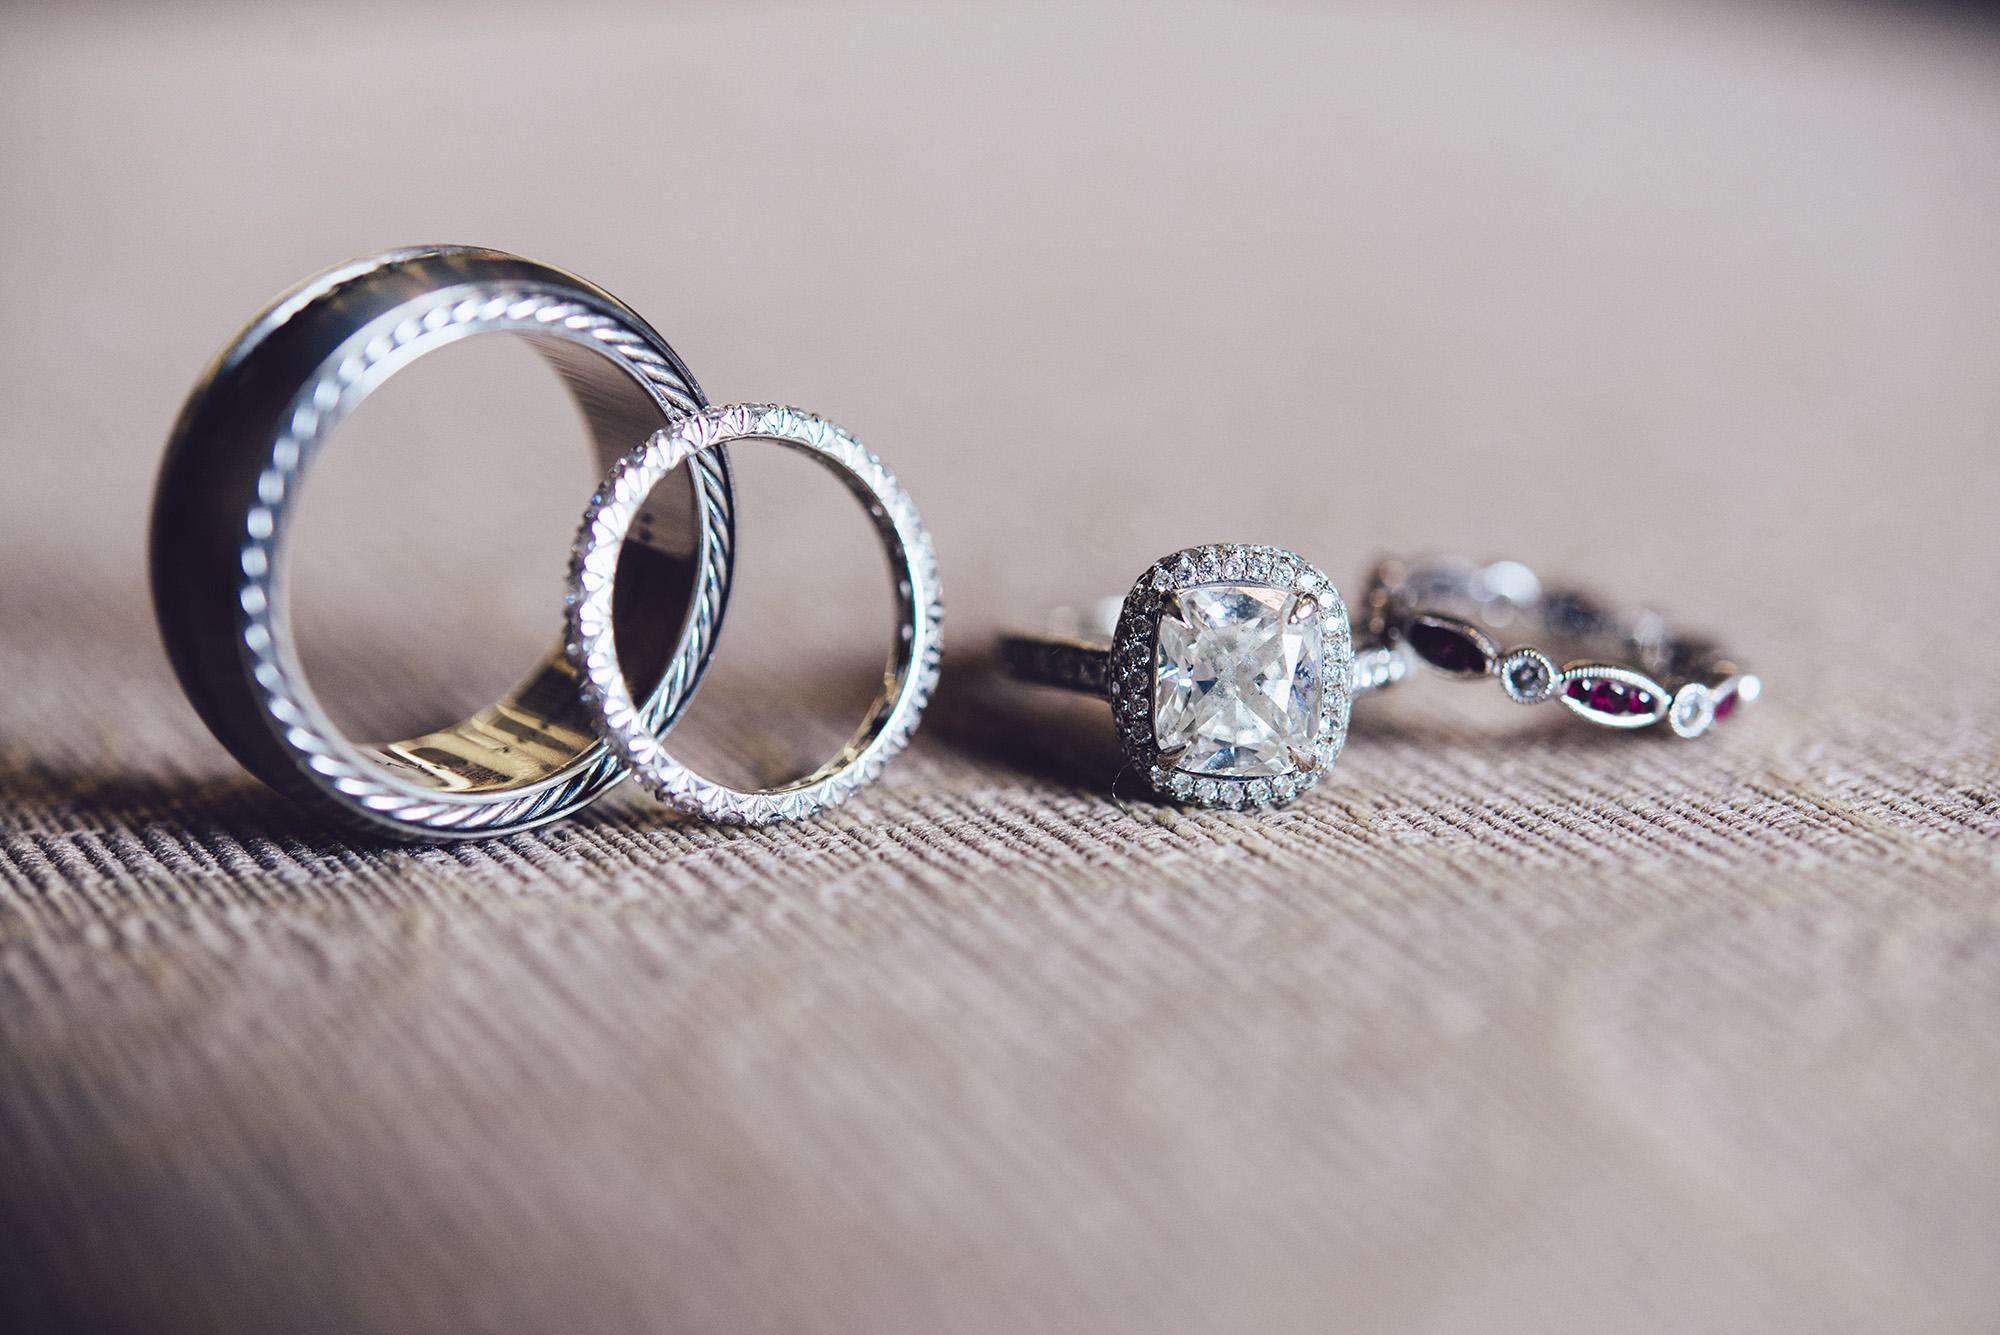 02 Hotel DuPont Wedding Philadelphia Wedding Planner Rings.jpg